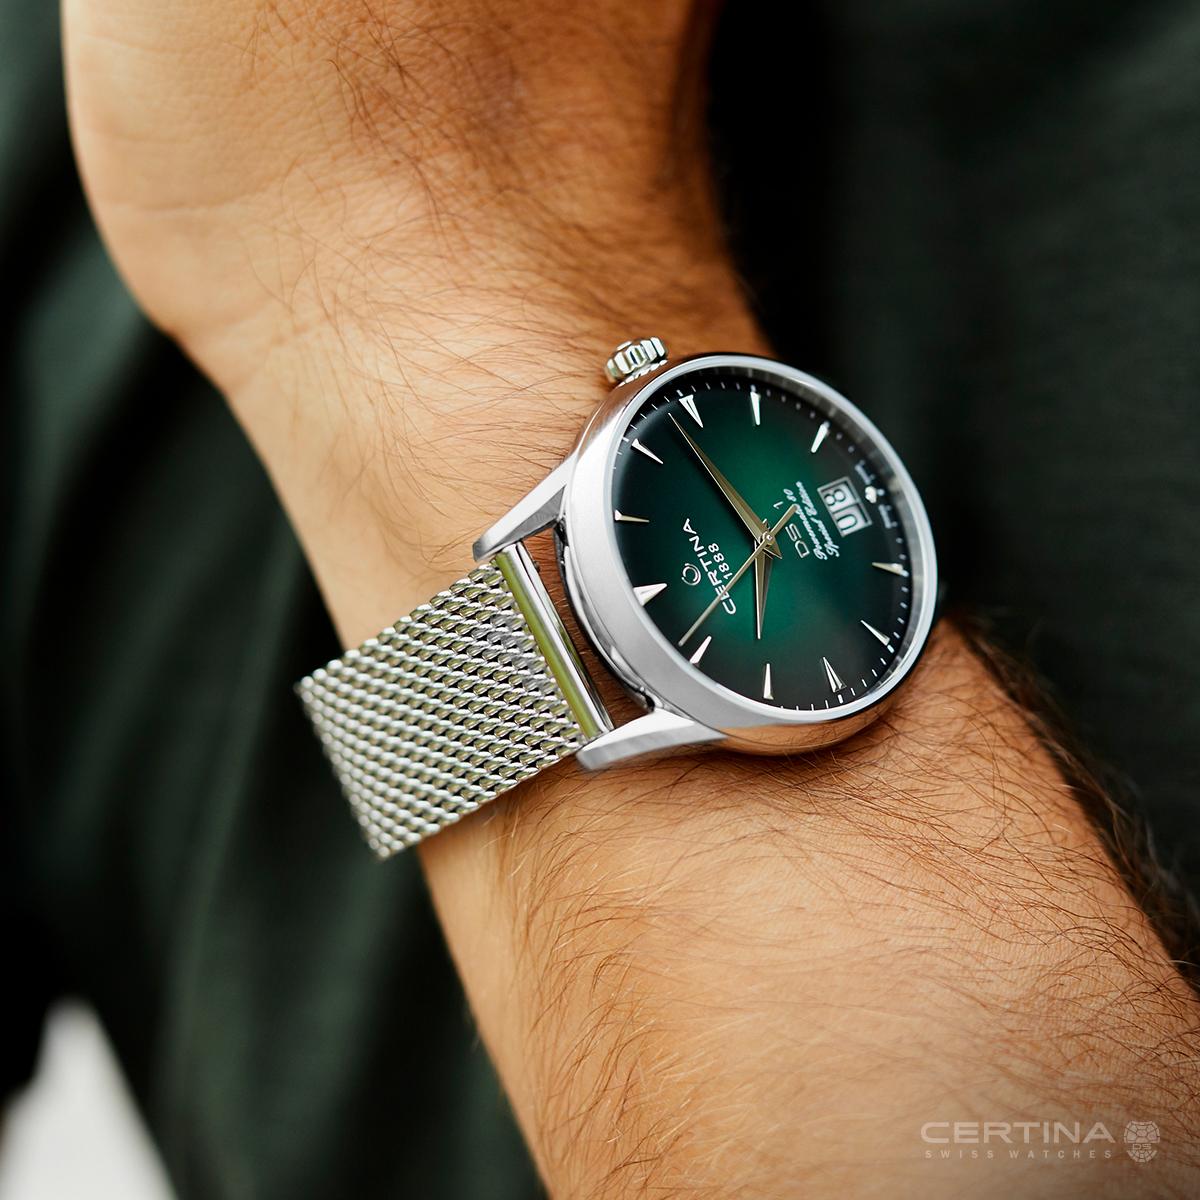 Elegancki zegarek Certina DS-1 Nivachron™ Big Date 60th Anniversary